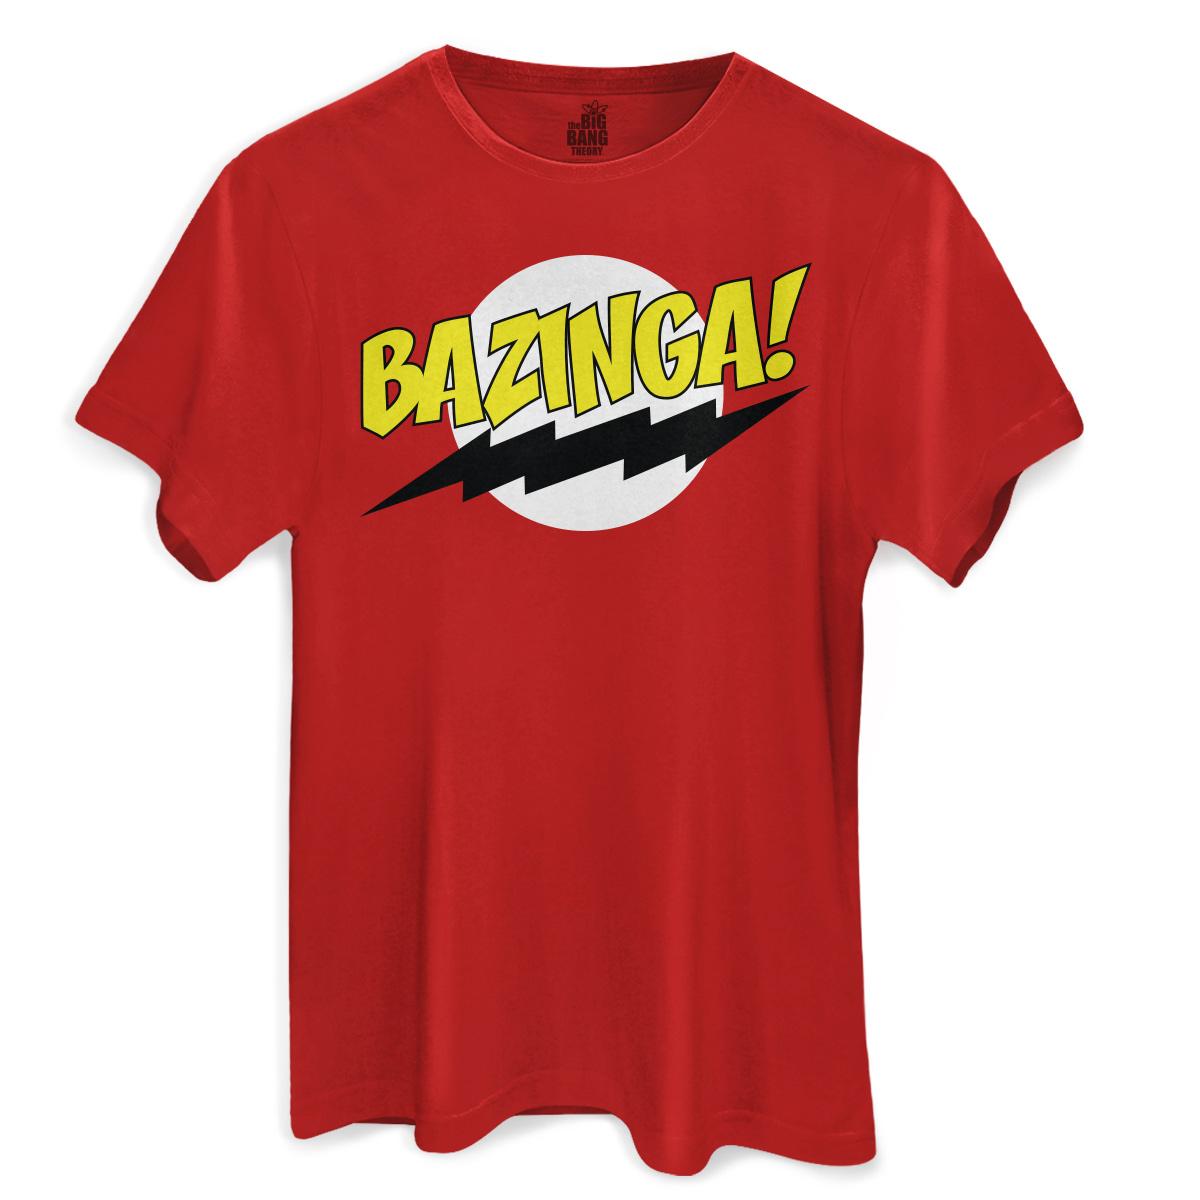 Camiseta Masculina The Big Bang Theory Bazinga! Clássica